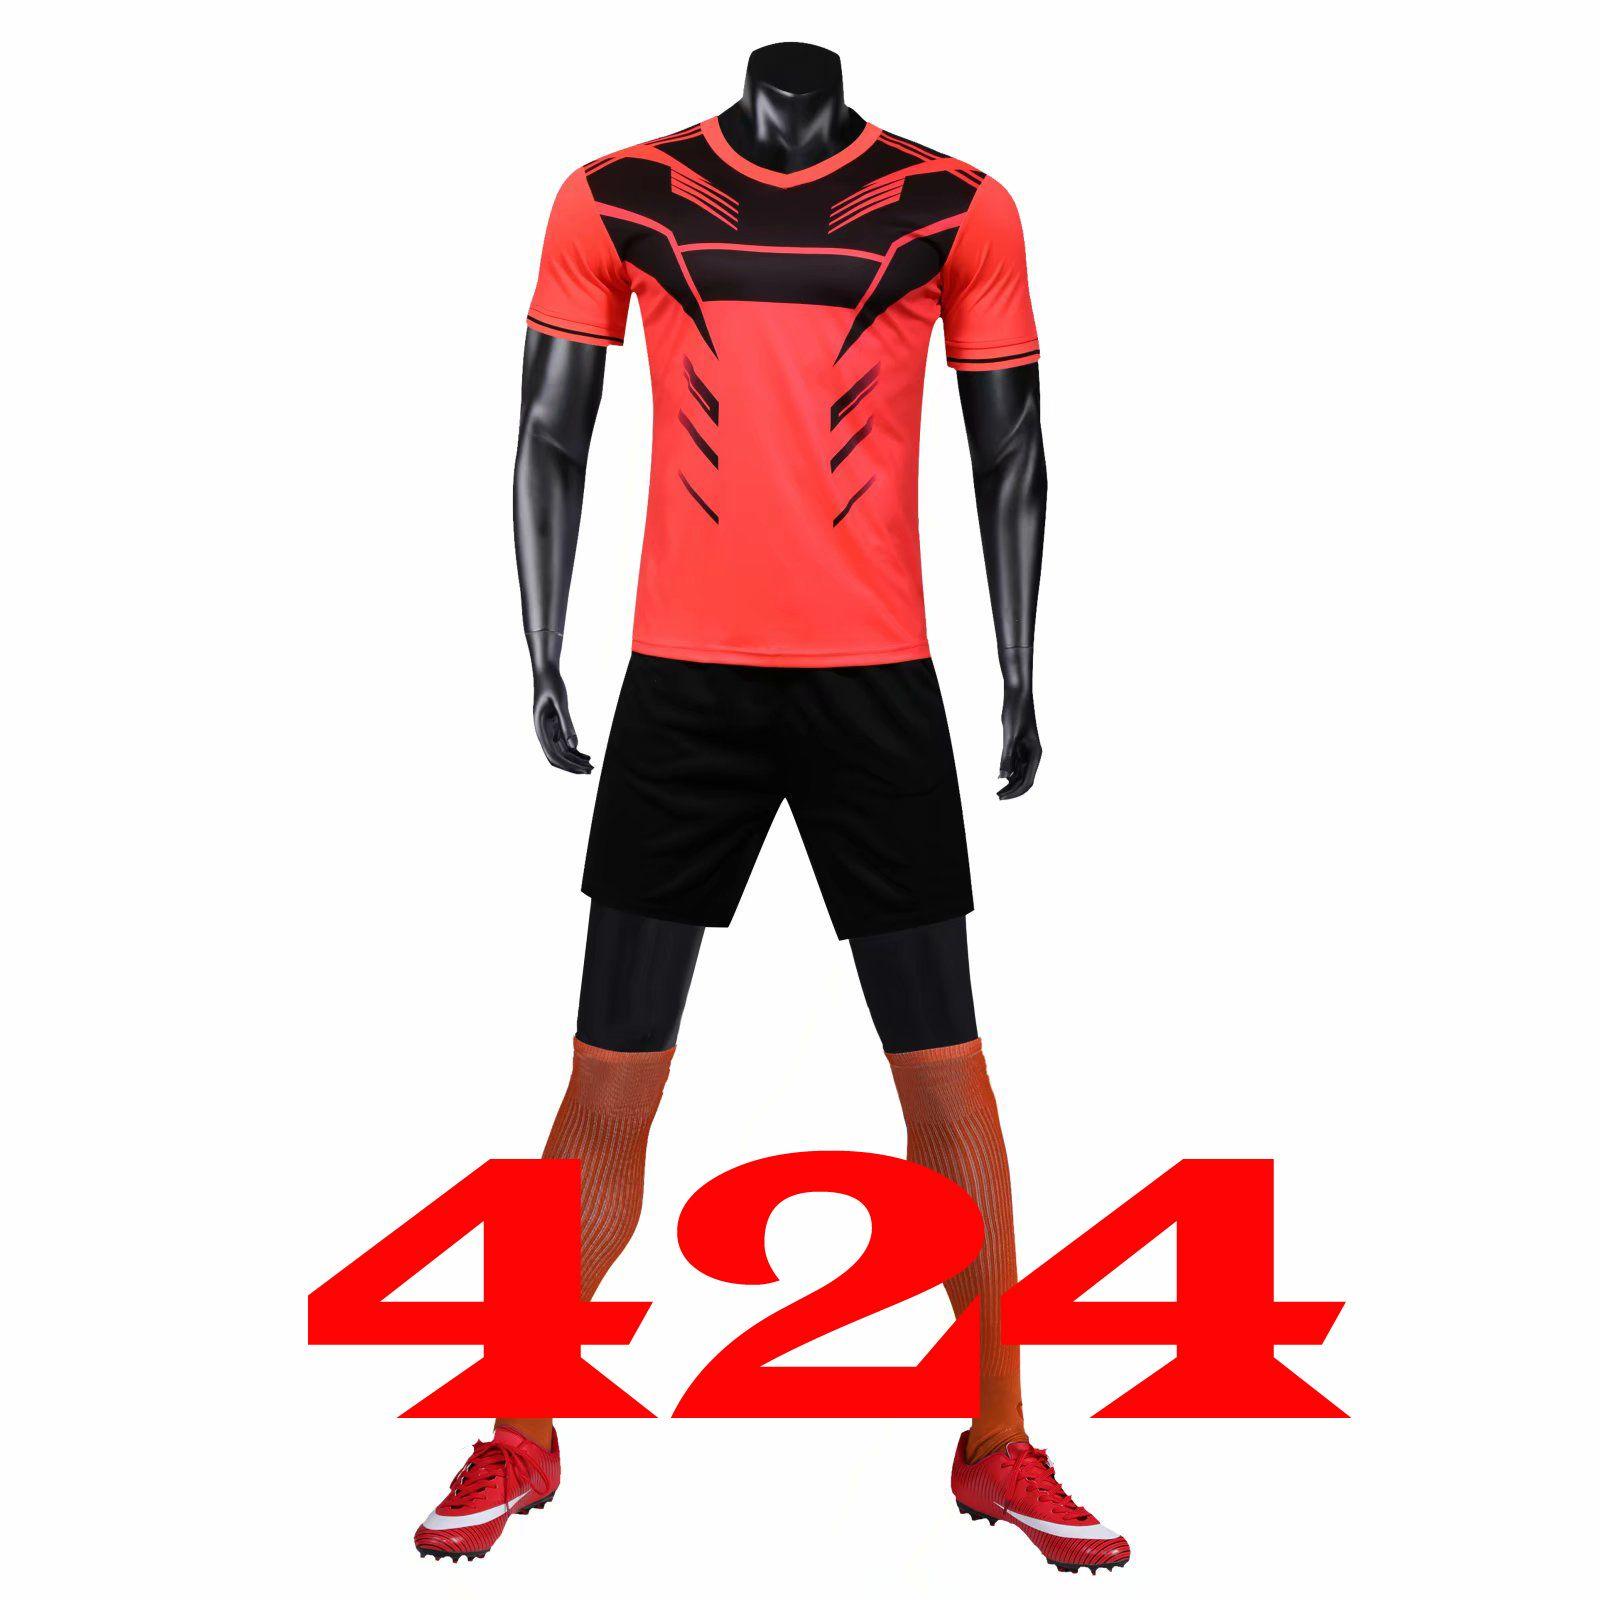 Sports Clothes Badminton Wear Shirts Men Golf T-shirt Table Tennis Shirts Quick Dry Breathable Training kits Sportswear 424